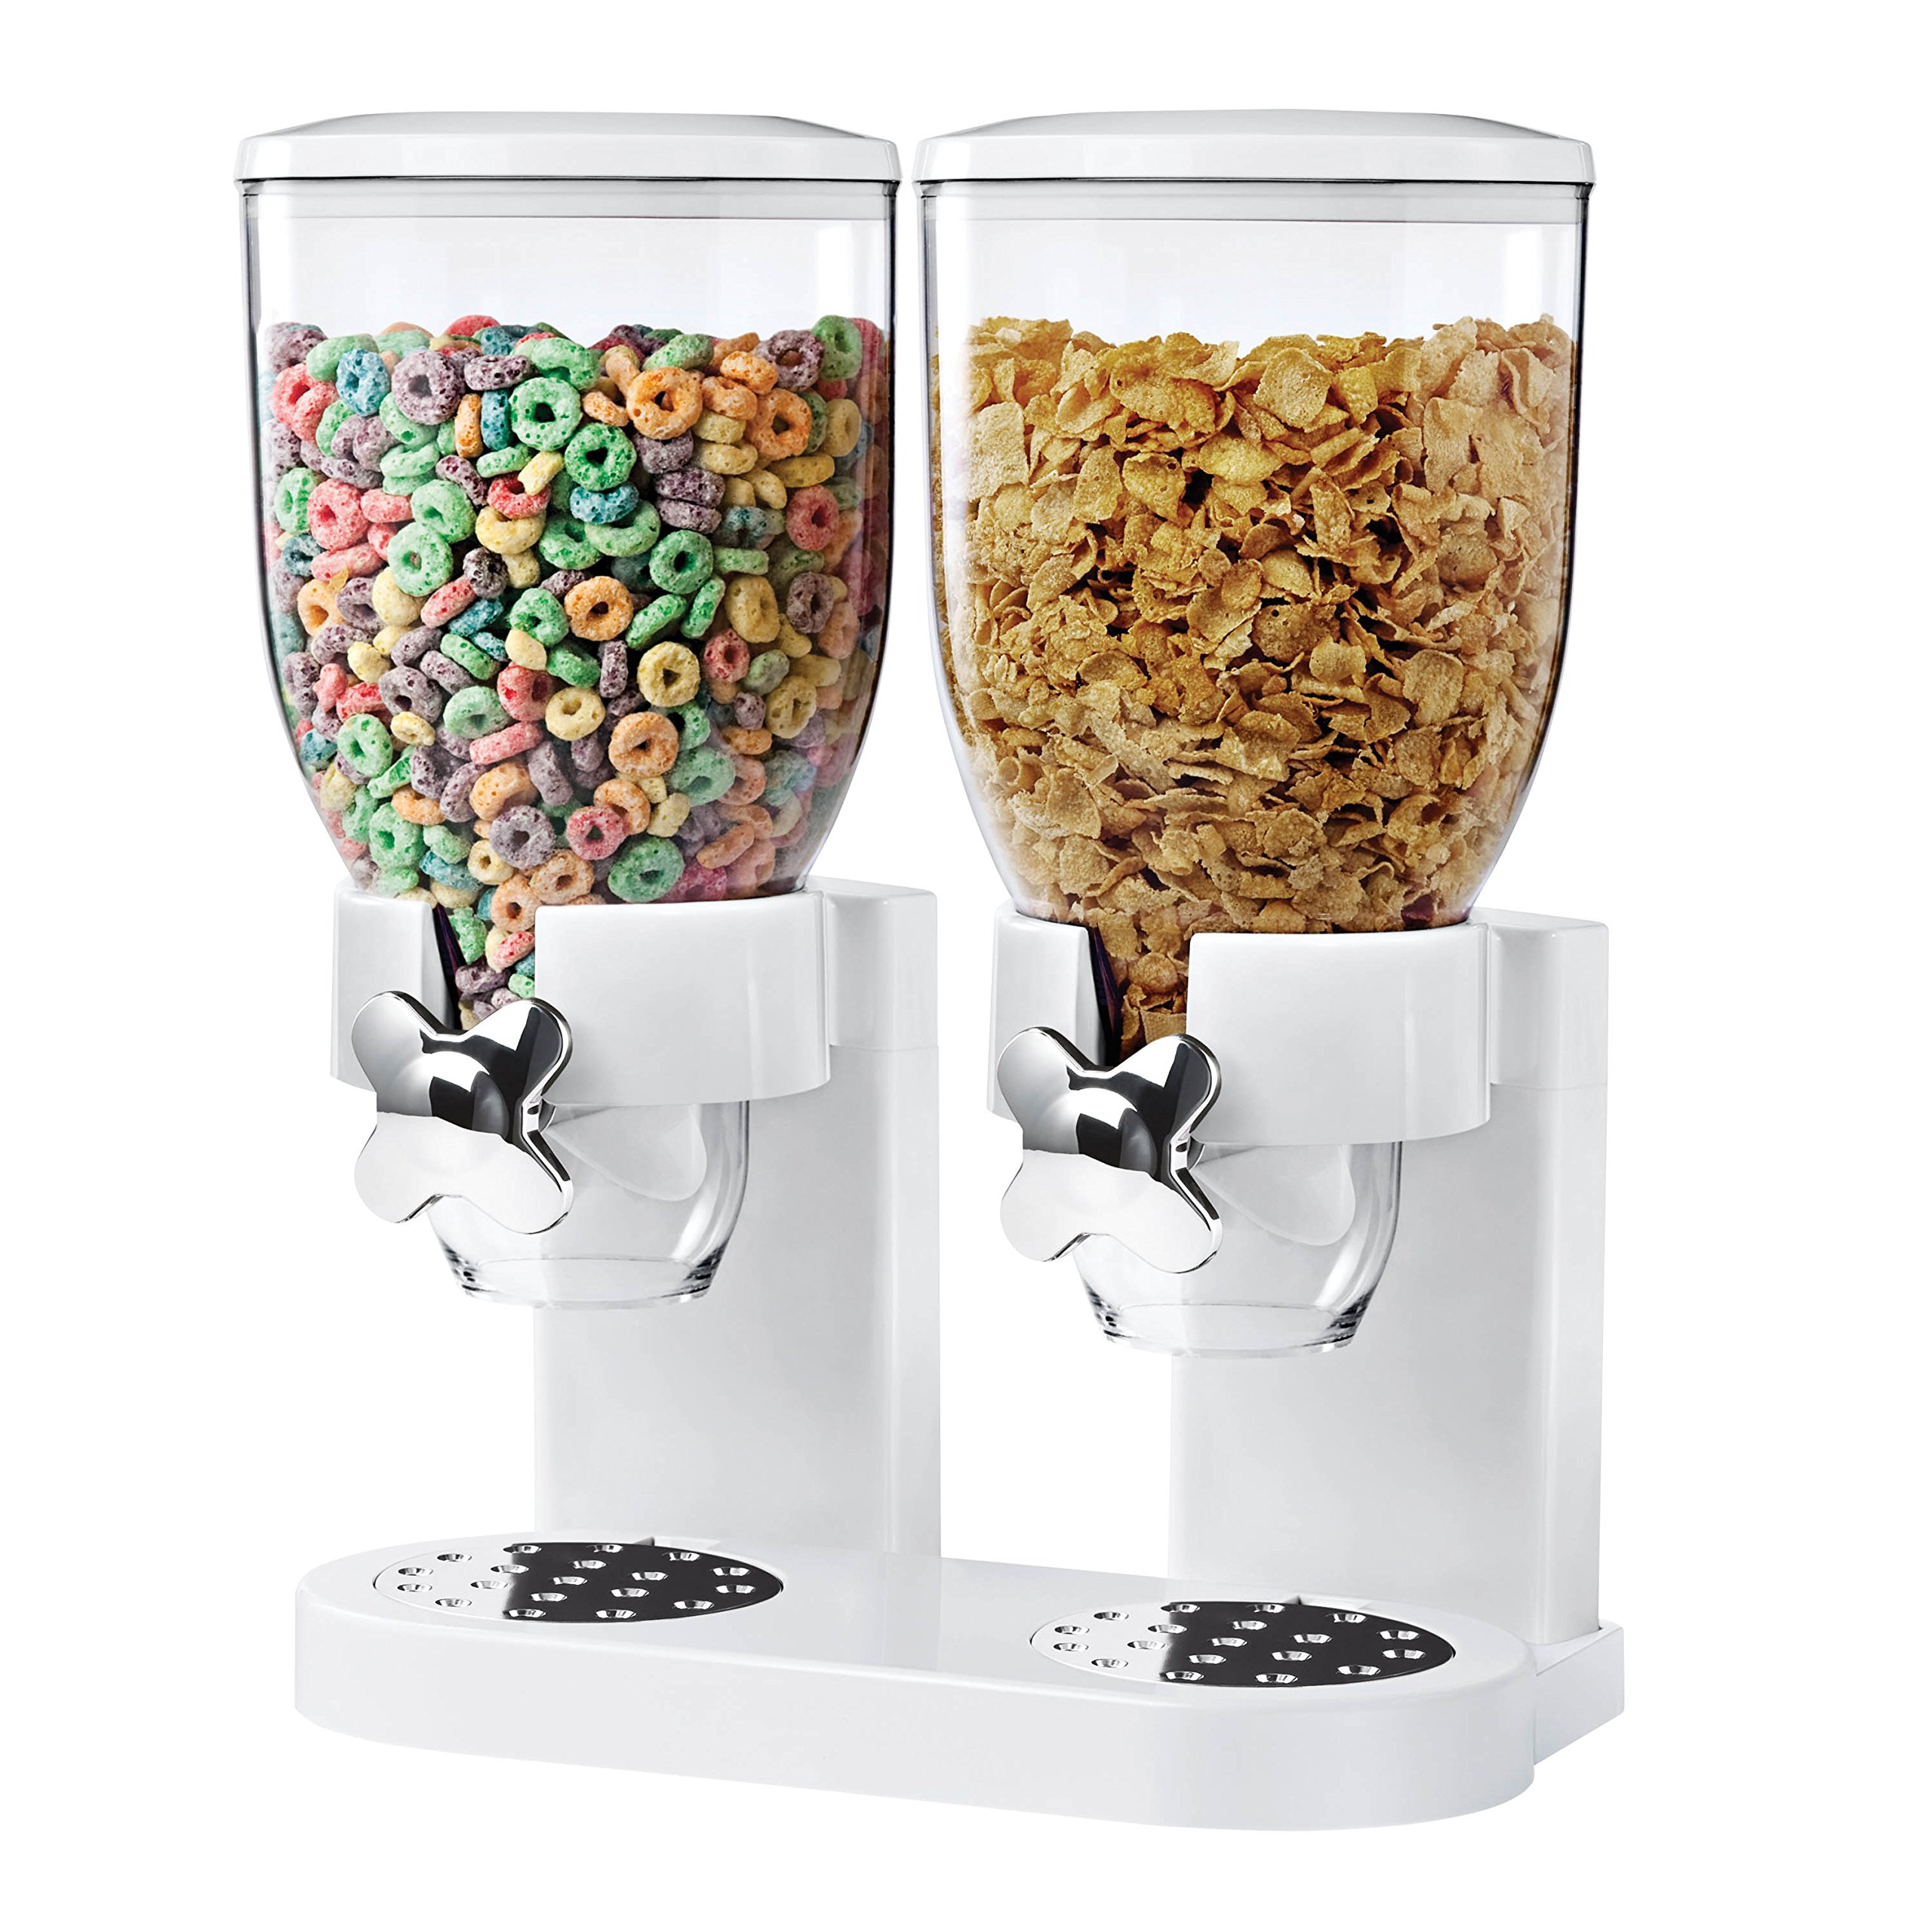 Zevro KCH-06123 Control Dual Dry Food Dispenser, White/Chrome